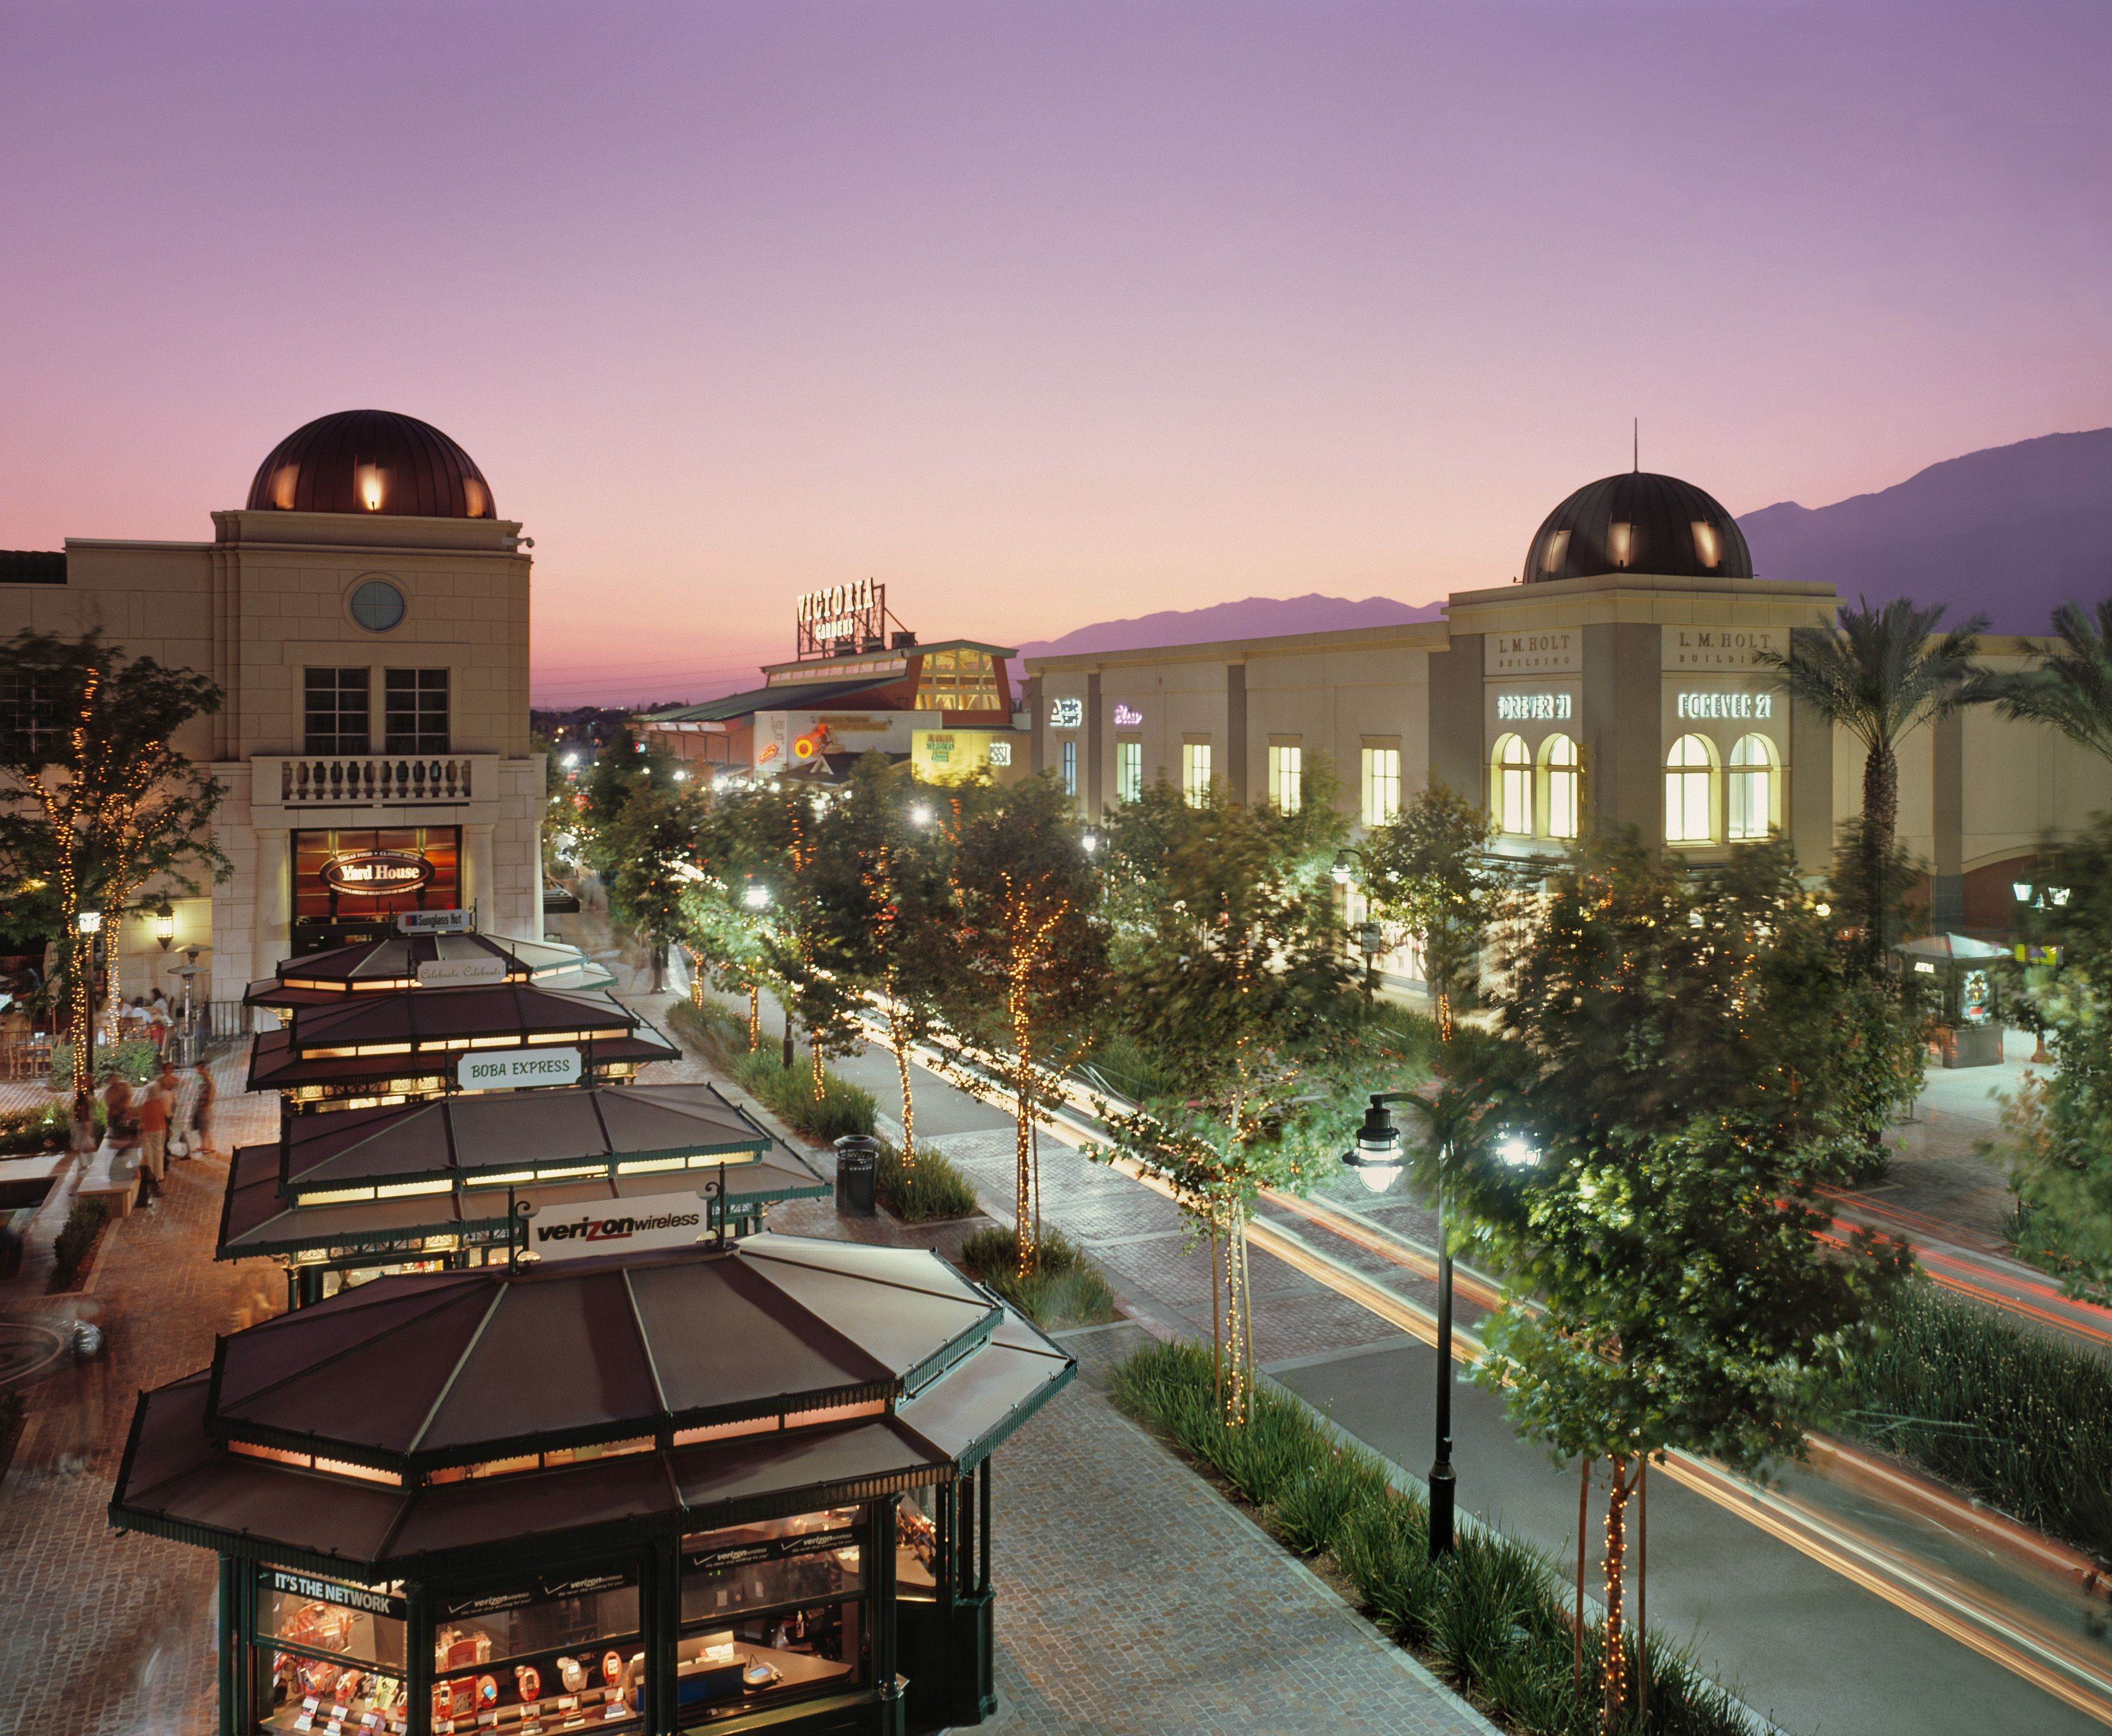 c76895a76d12589020d09286c02a44dc - Restaurants At Victoria Gardens Rancho Cucamonga California